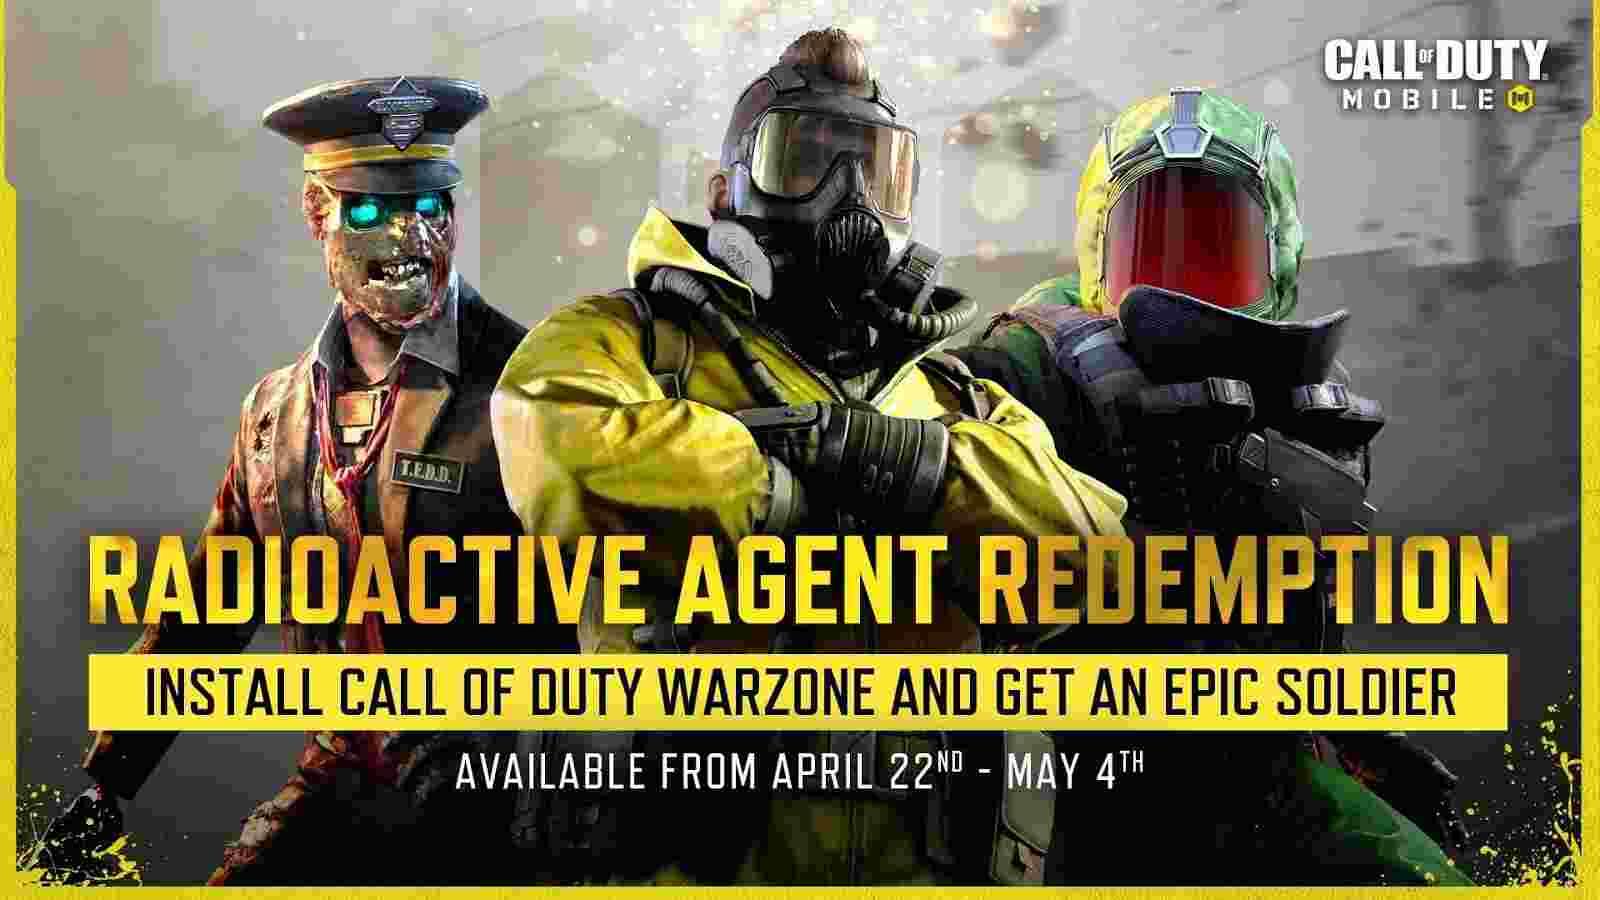 cod Radioactive Agent Redemption event